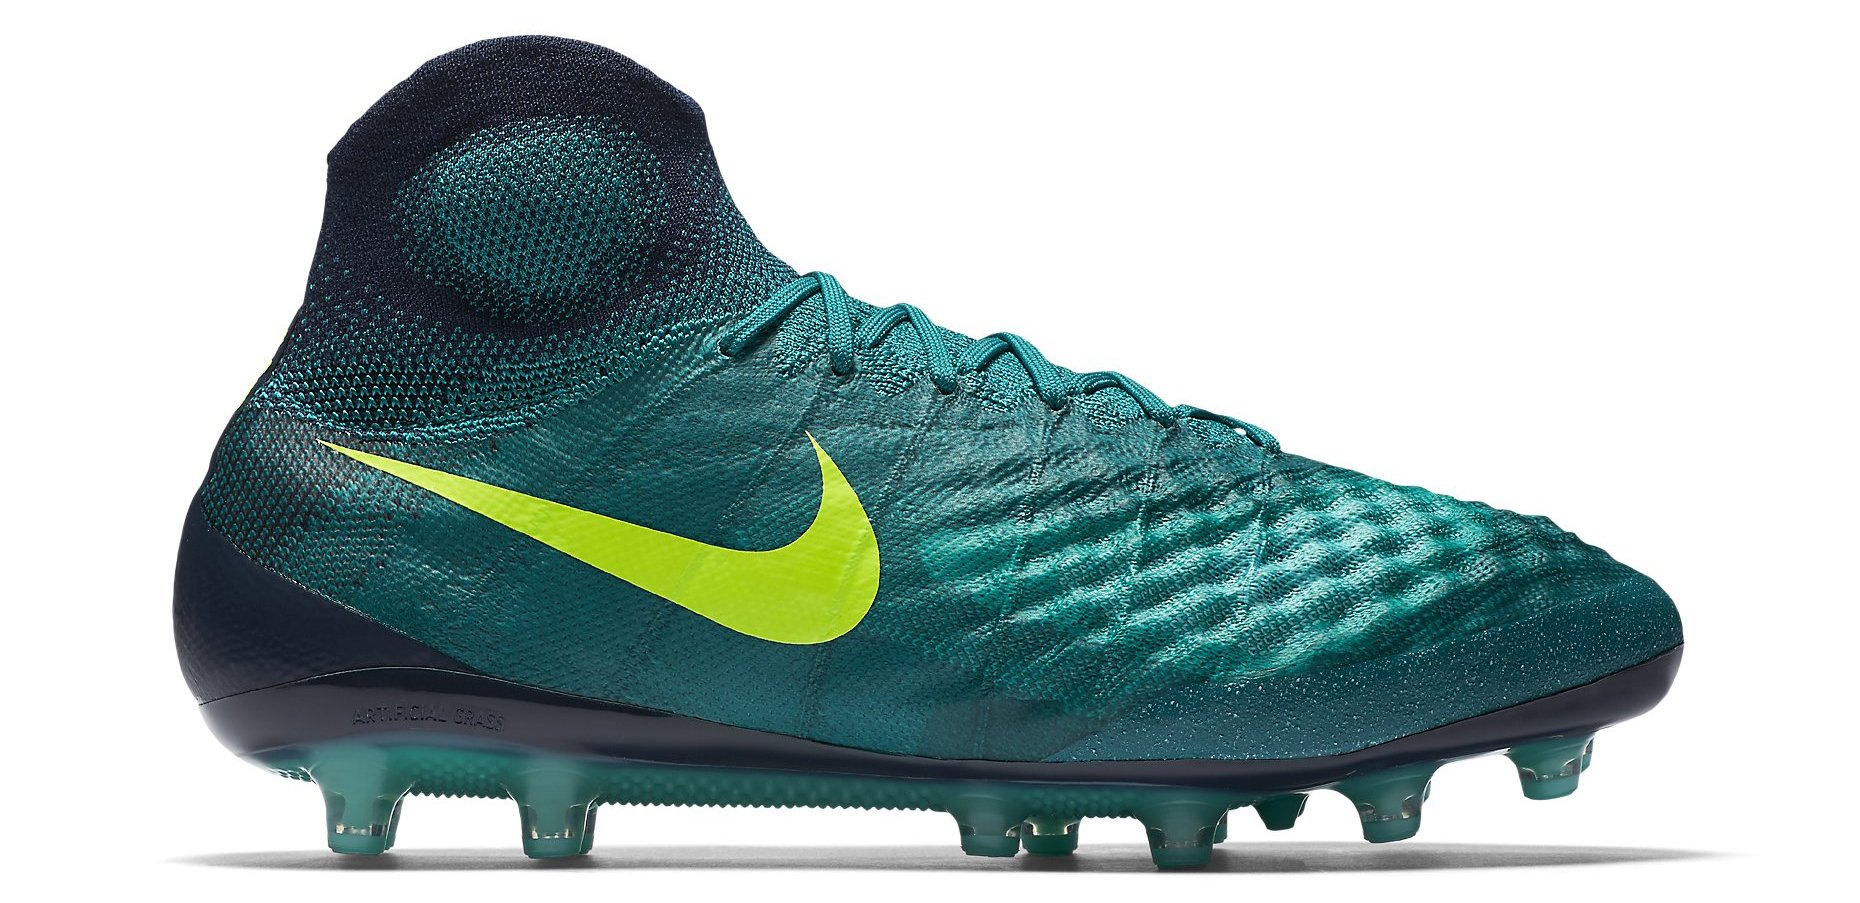 Kopačky Nike Magista Obra II AG-PRO